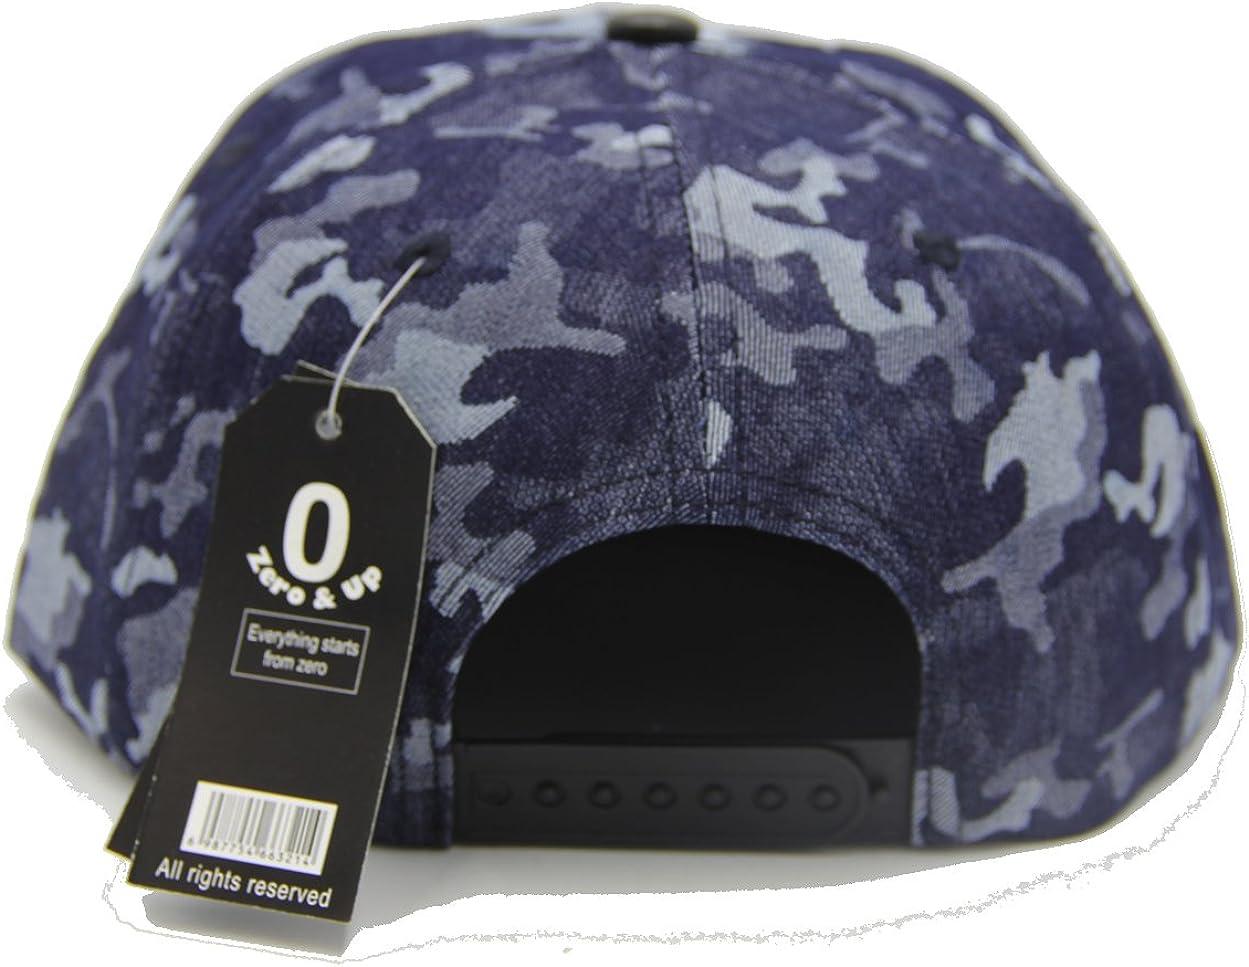 Zero /& Up Blue Camo  Boys Baseball Cap Snapback Hat one Size Fits Most